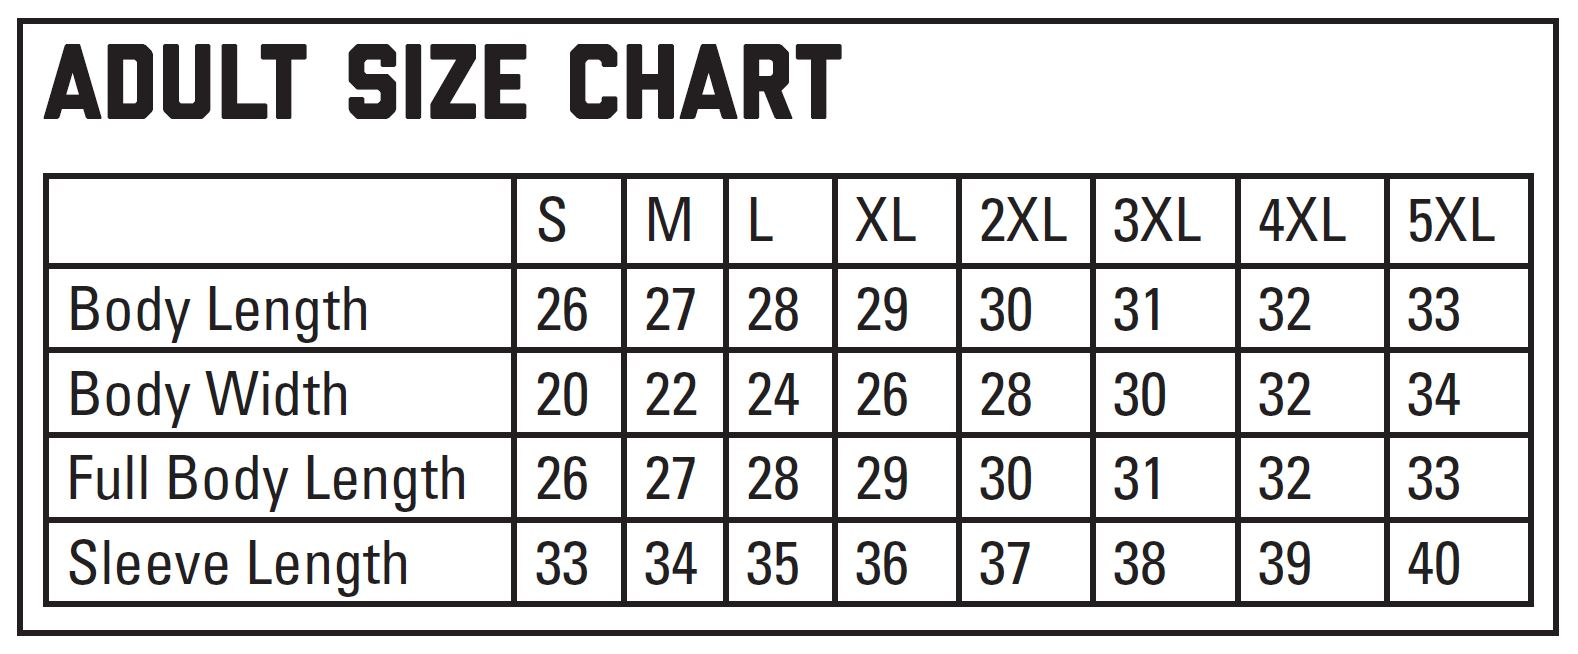 hoodie-size-chart.jpg